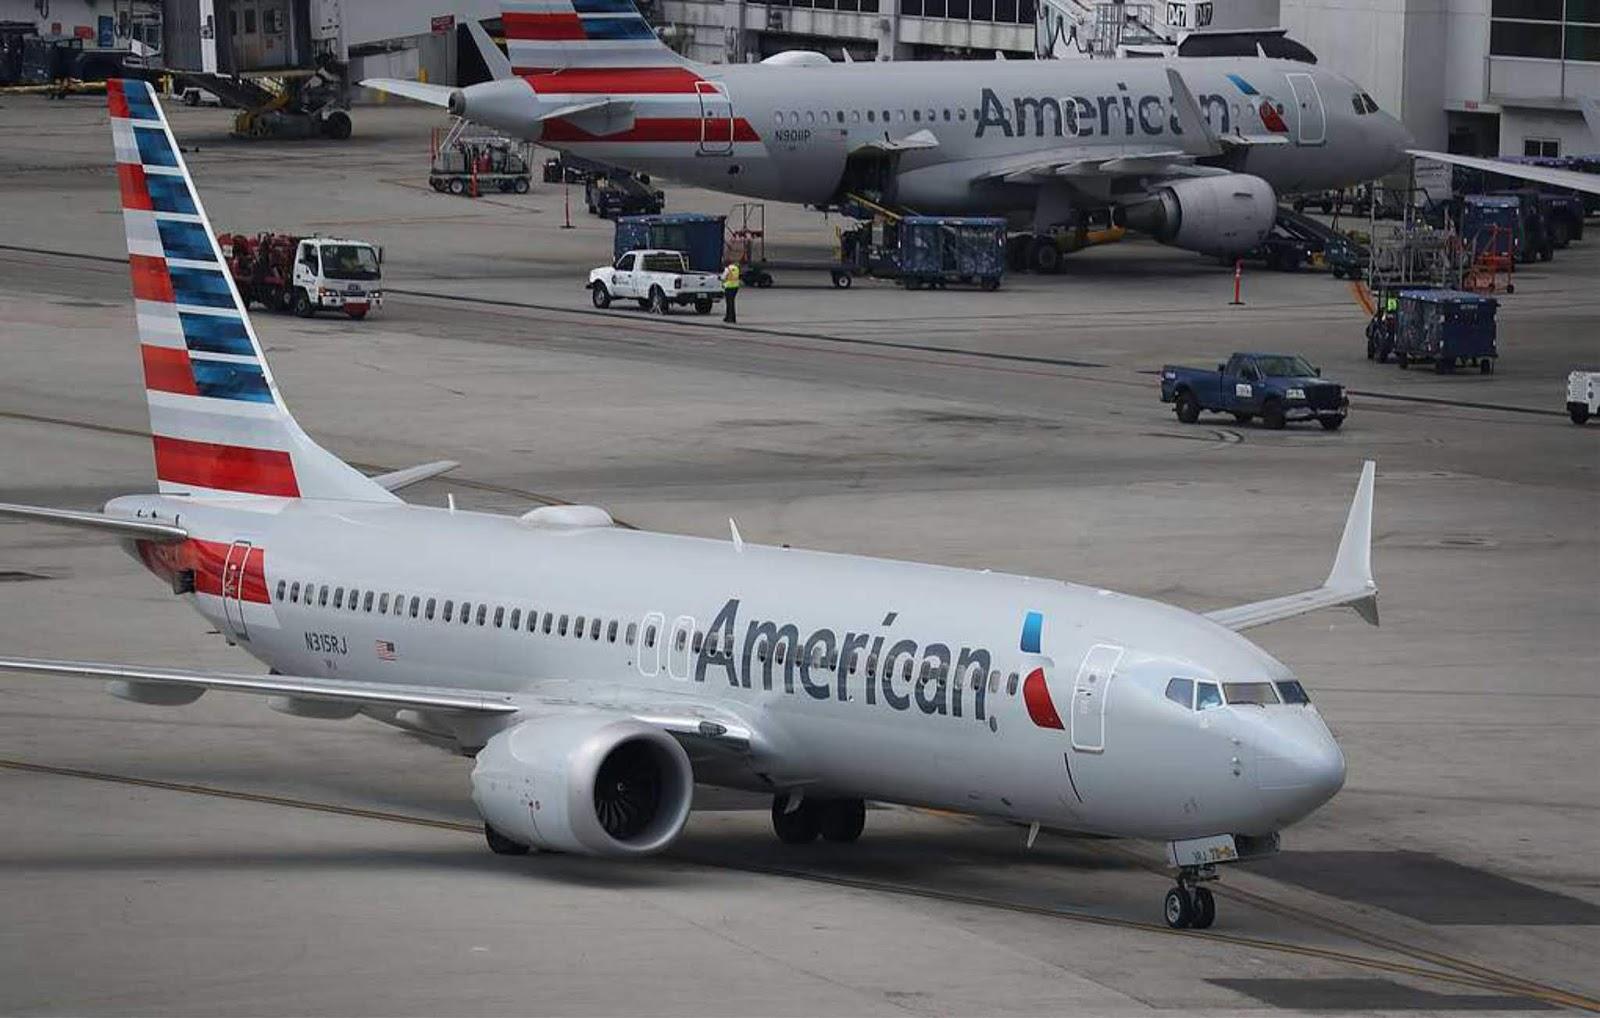 Boeing mengatakan mereka mengambil langkah-langkah untuk memastikan keamanan 737 MAX